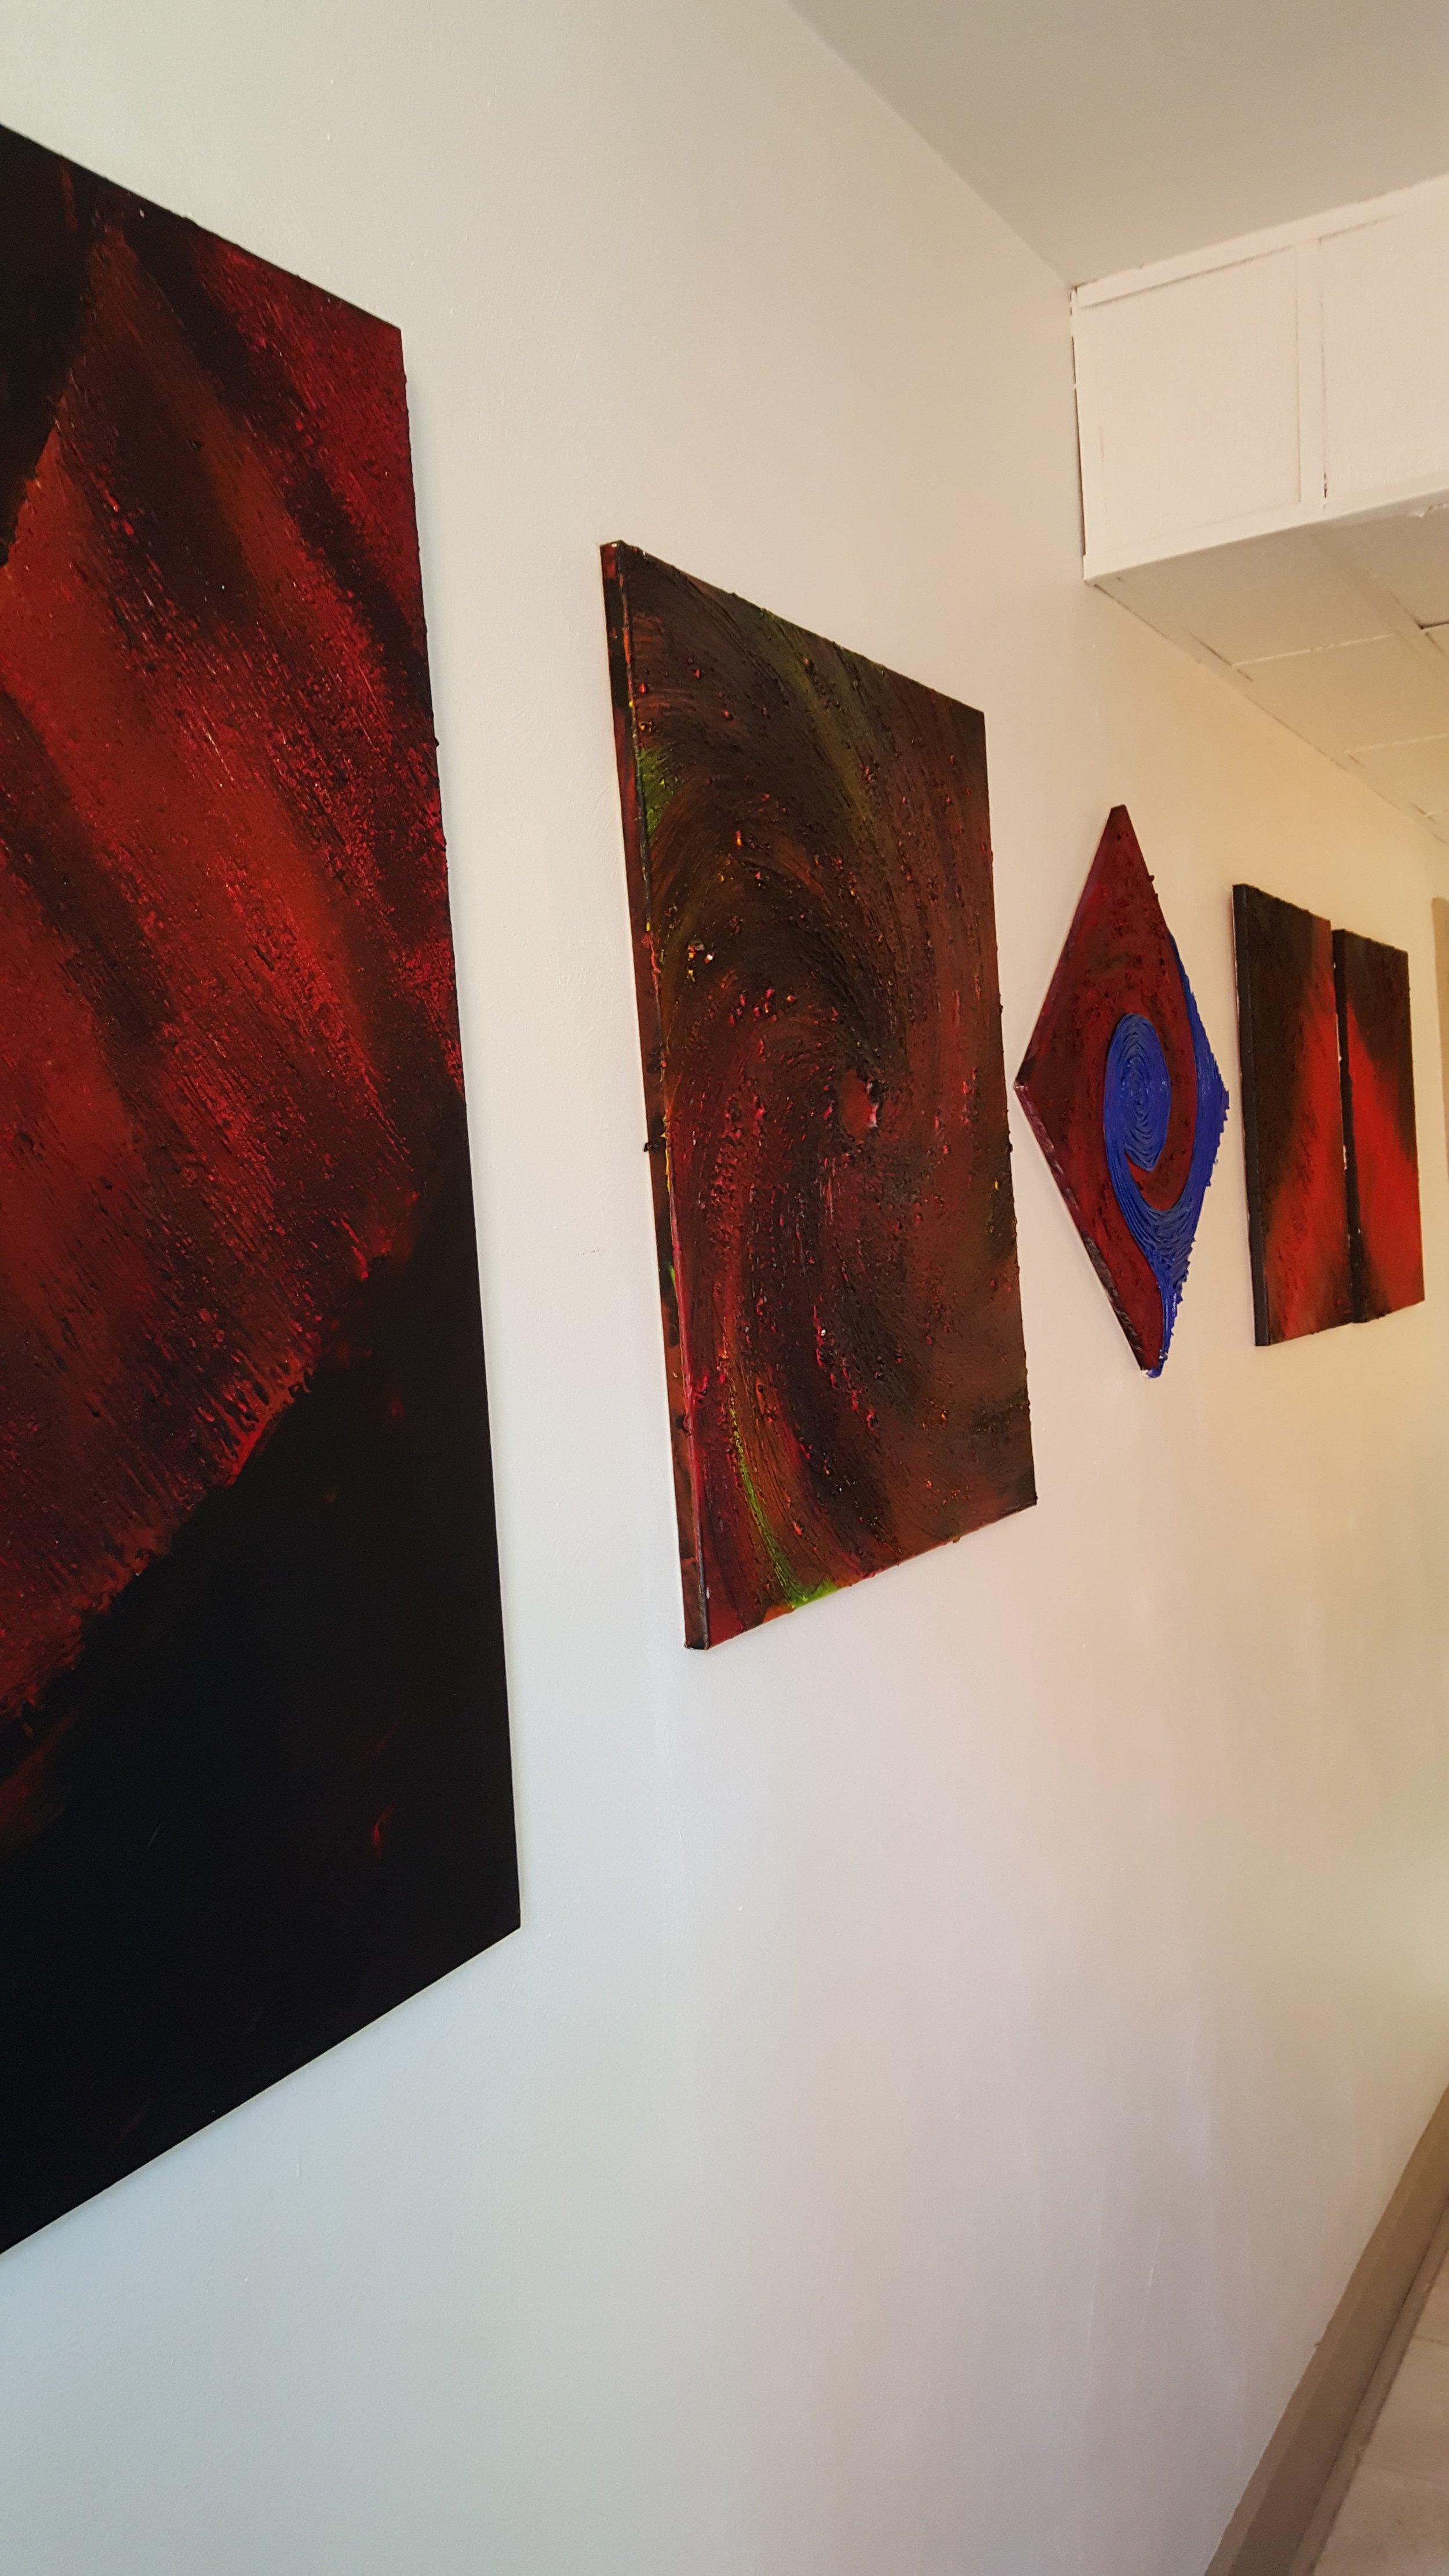 circle on the wall